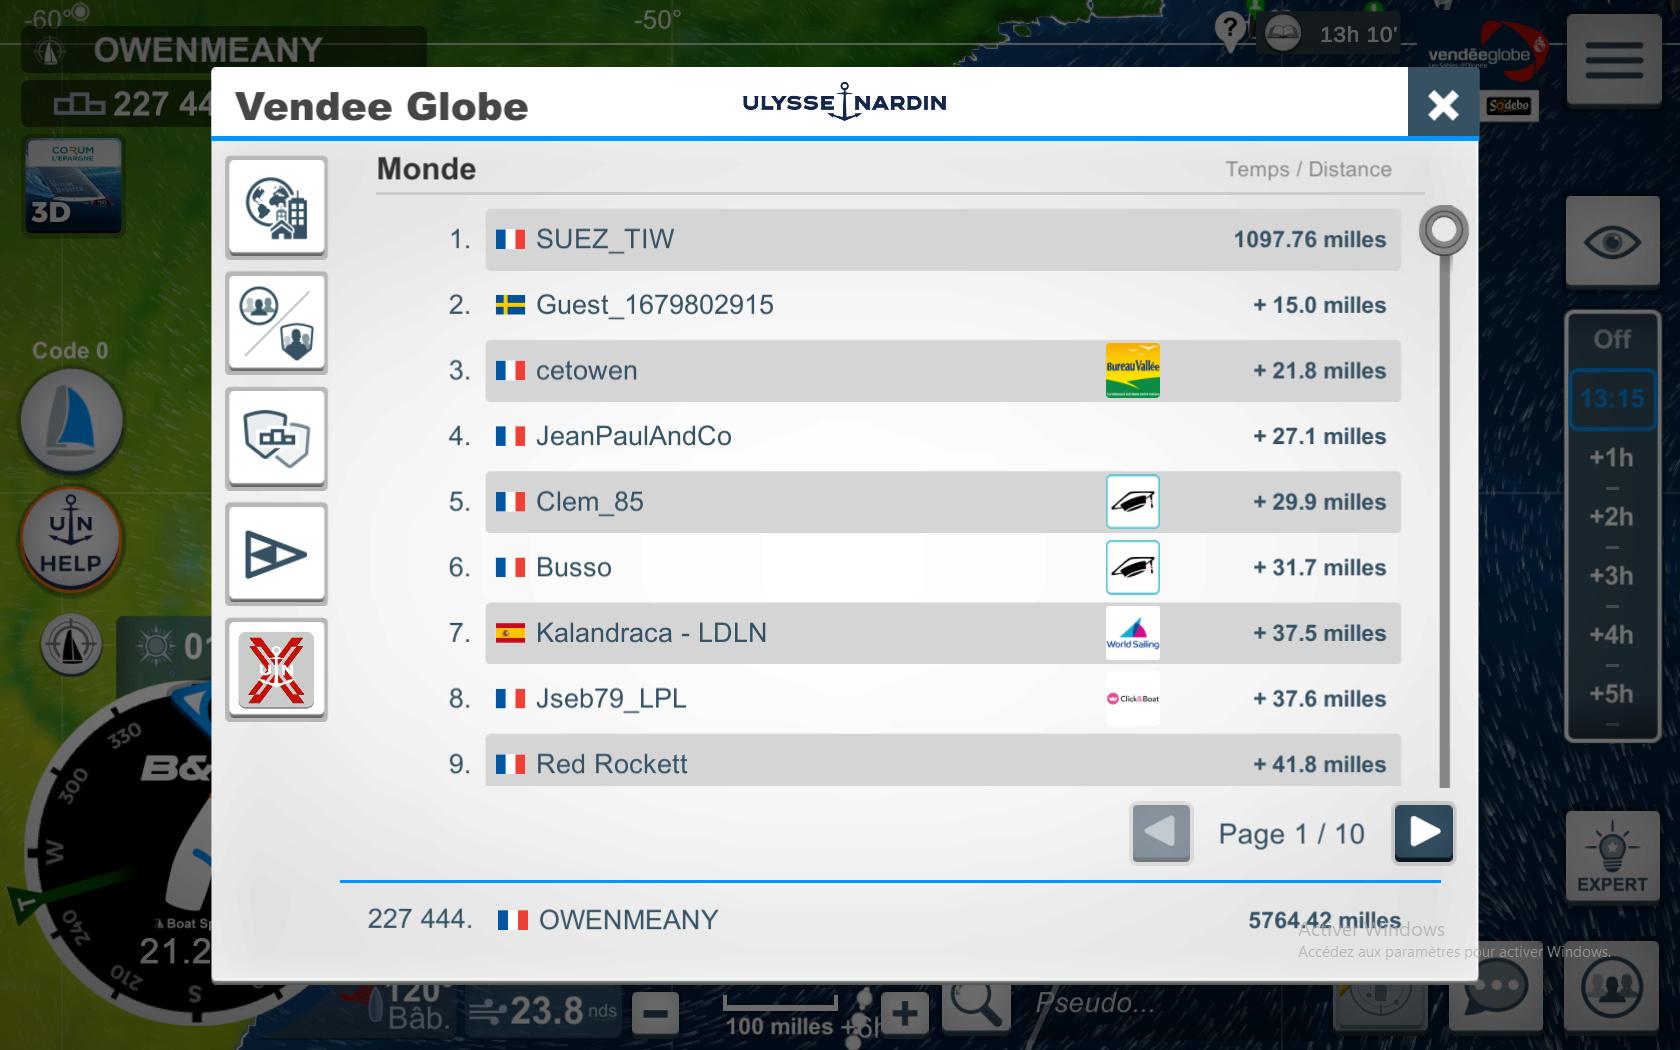 Vendée Globe virtuel: Virtual Regatta, édition 2020 - Page 2 Captur75